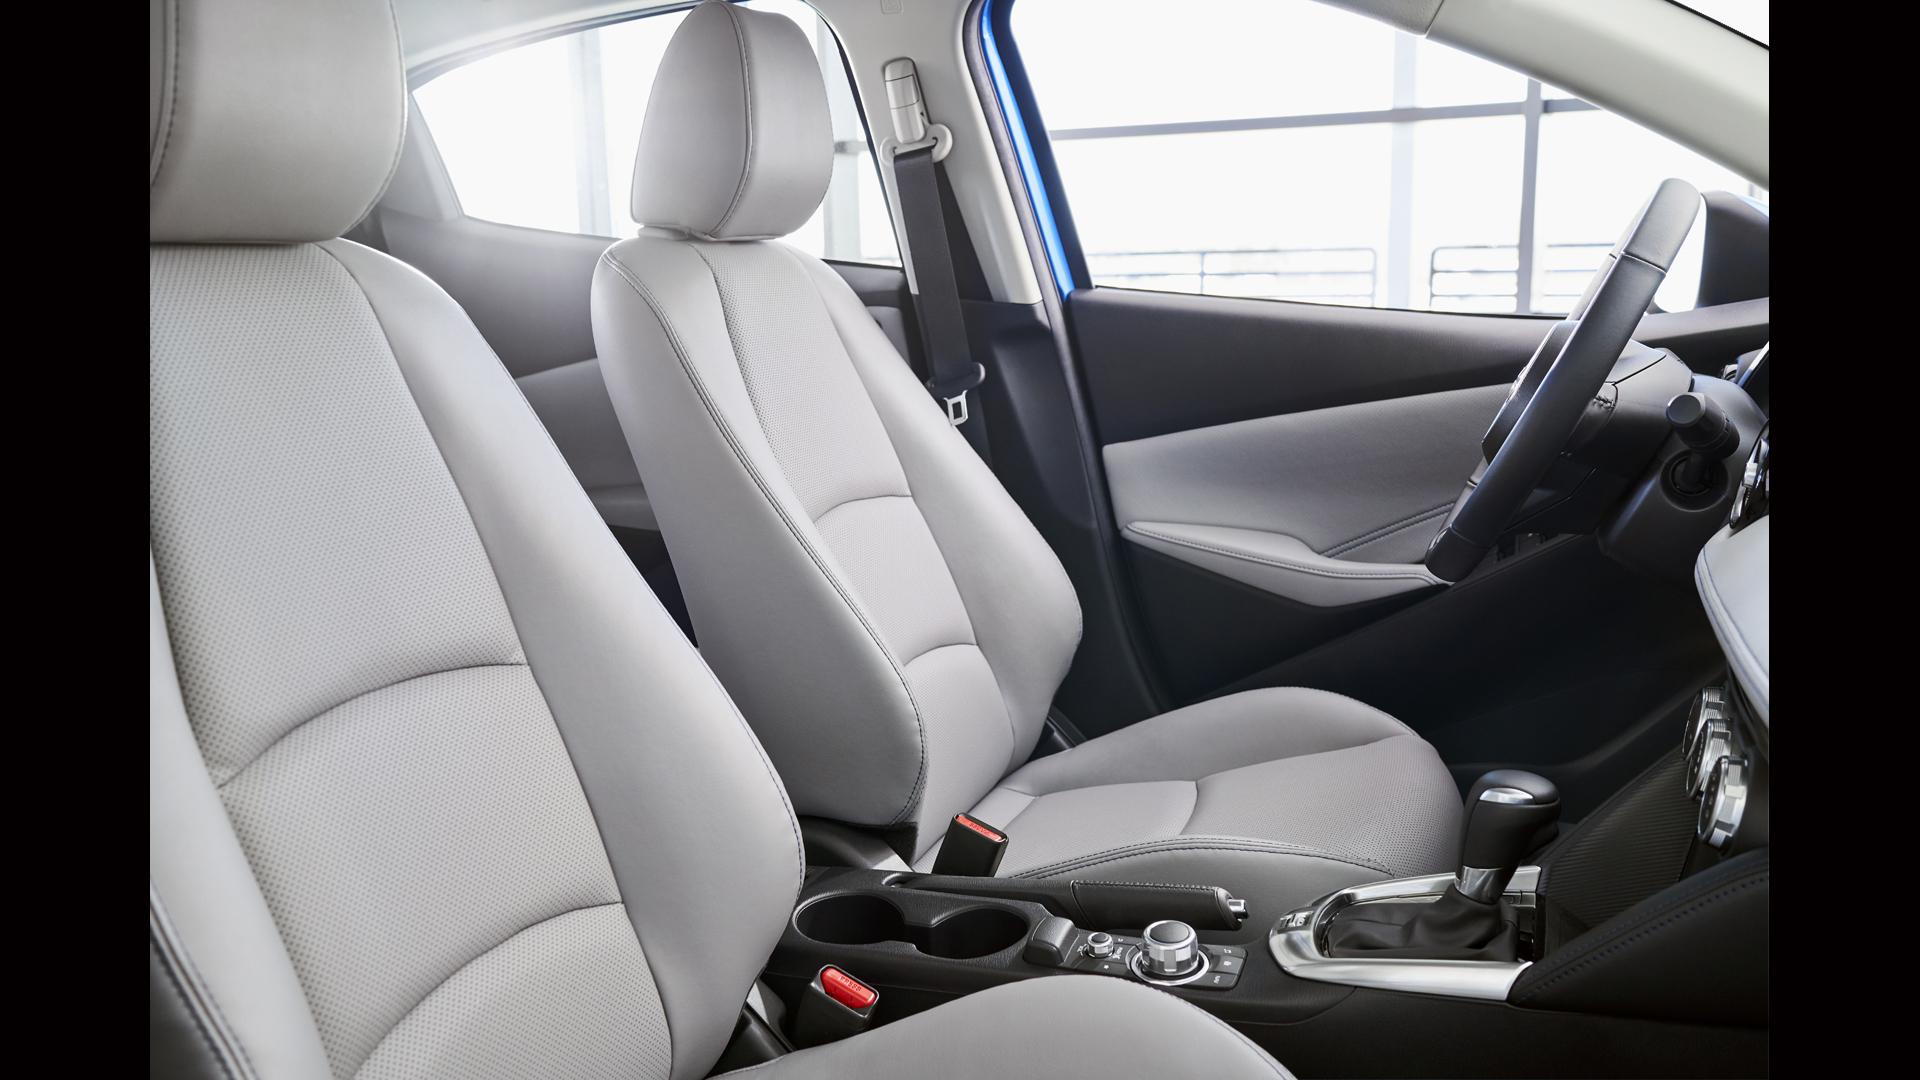 2020-toyota-yaris-hatchback-koltuklar